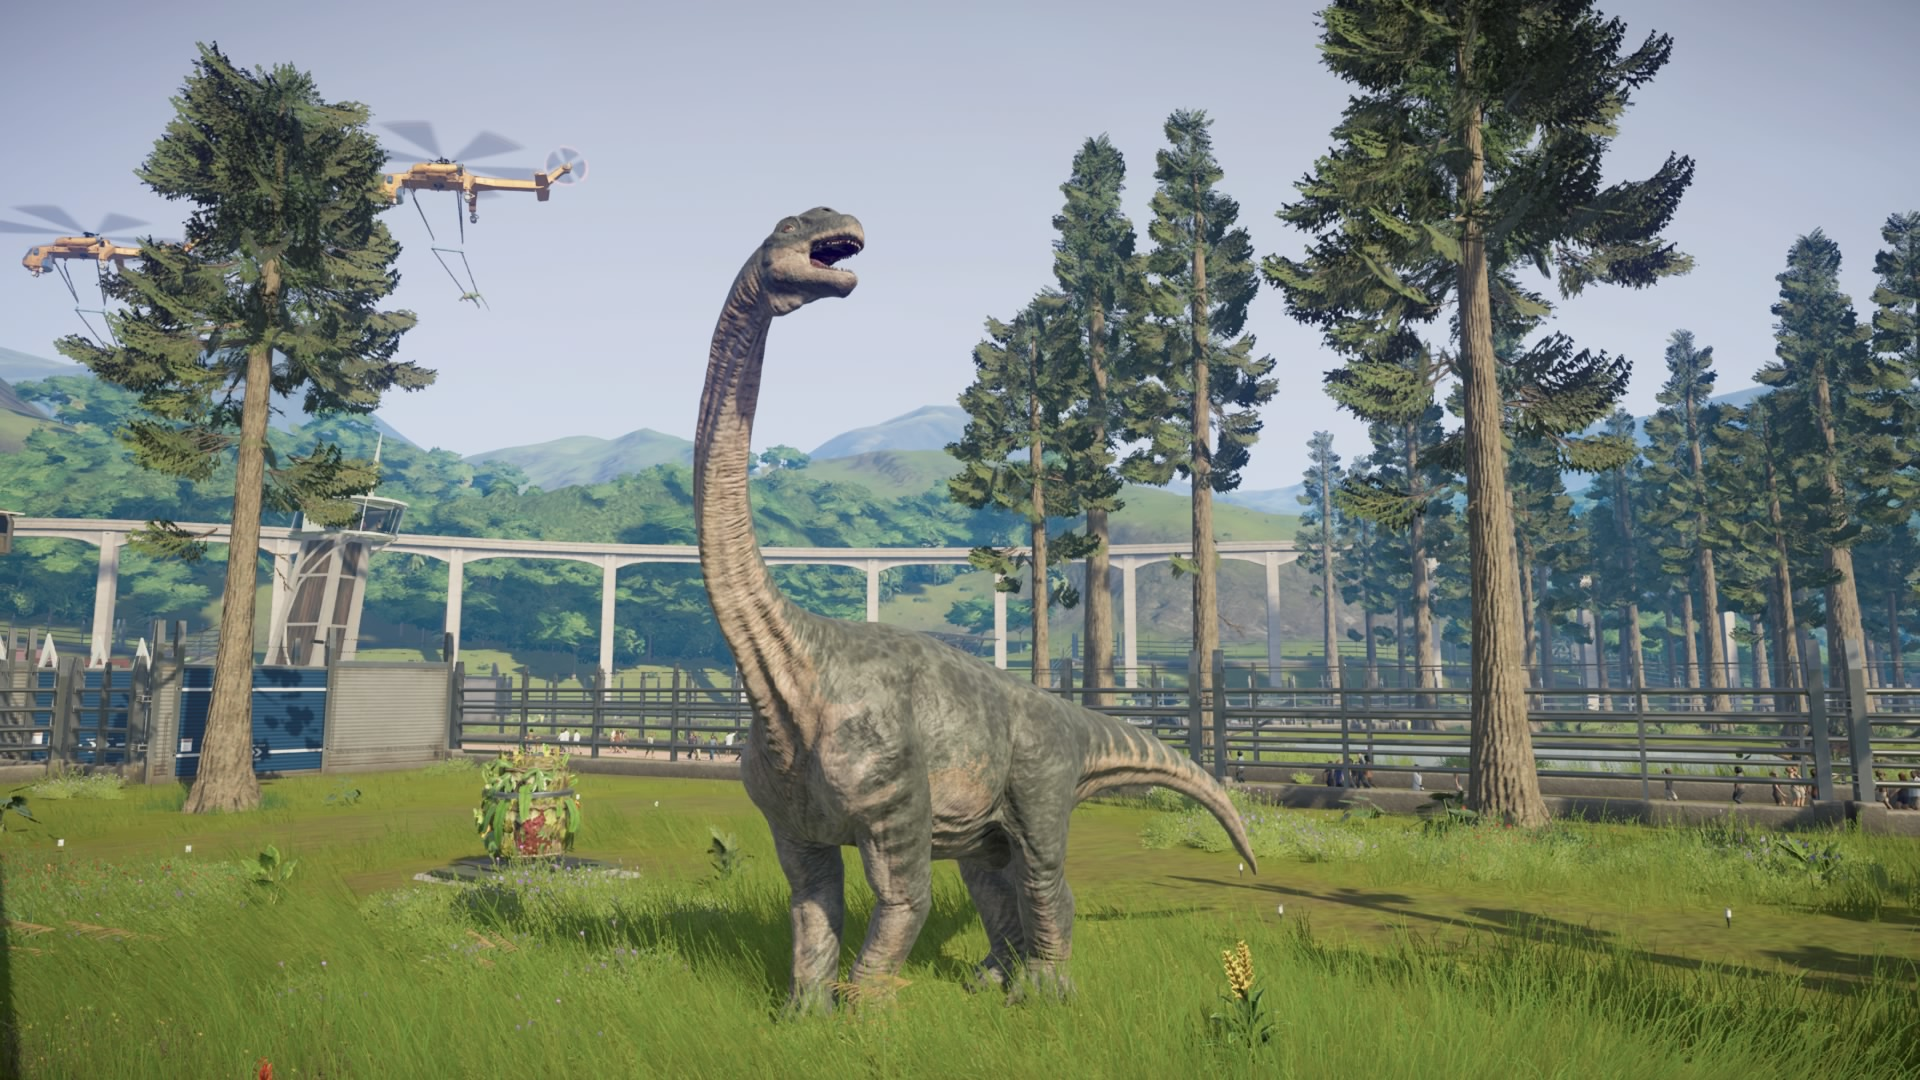 camarasaurussinging.jpg